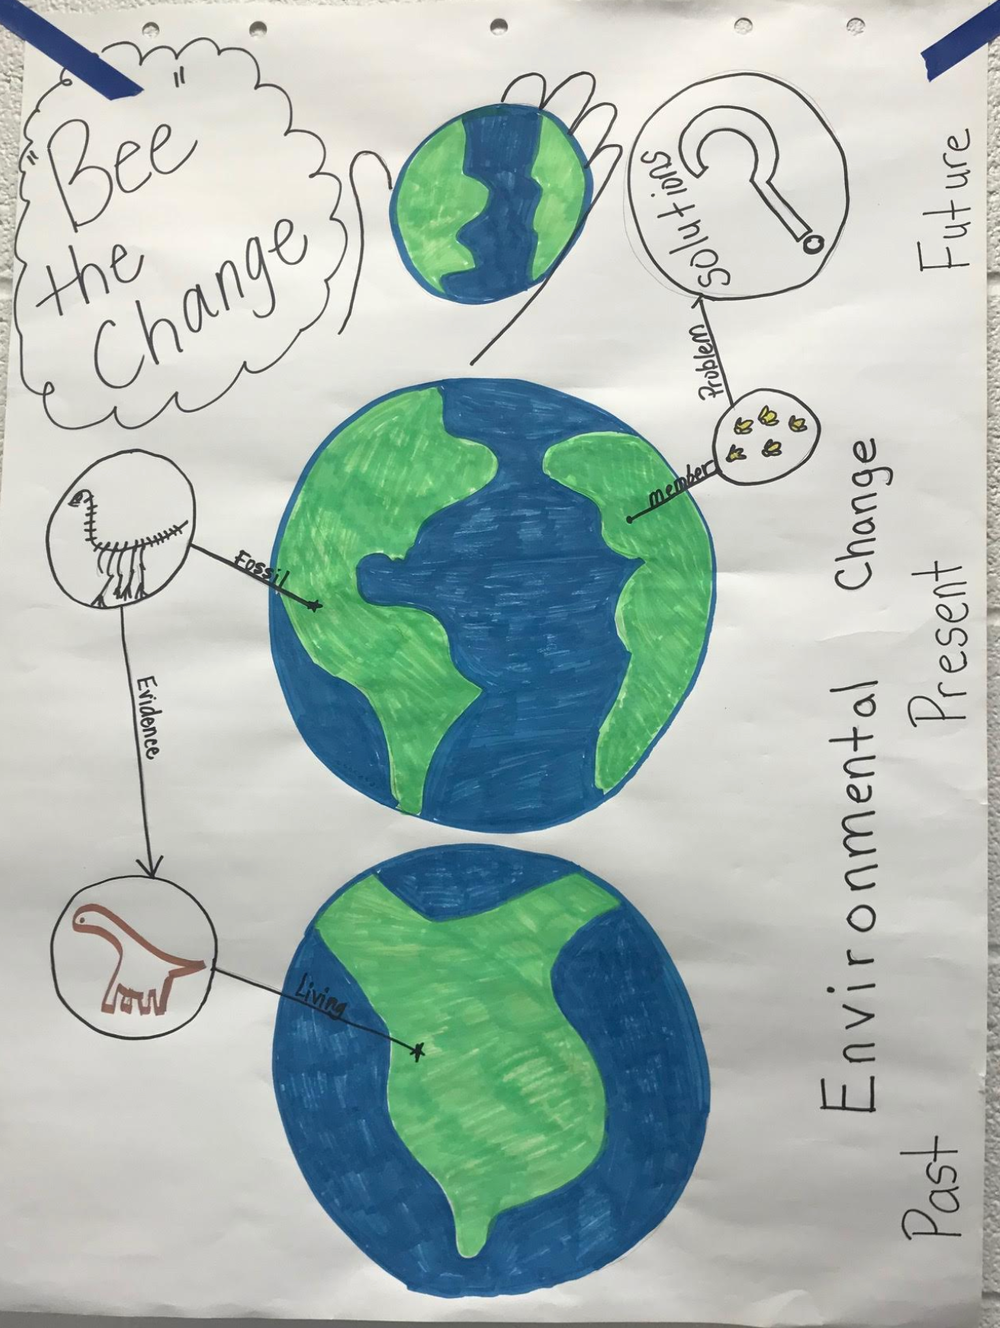 3_-_Ecosystem Changew.png